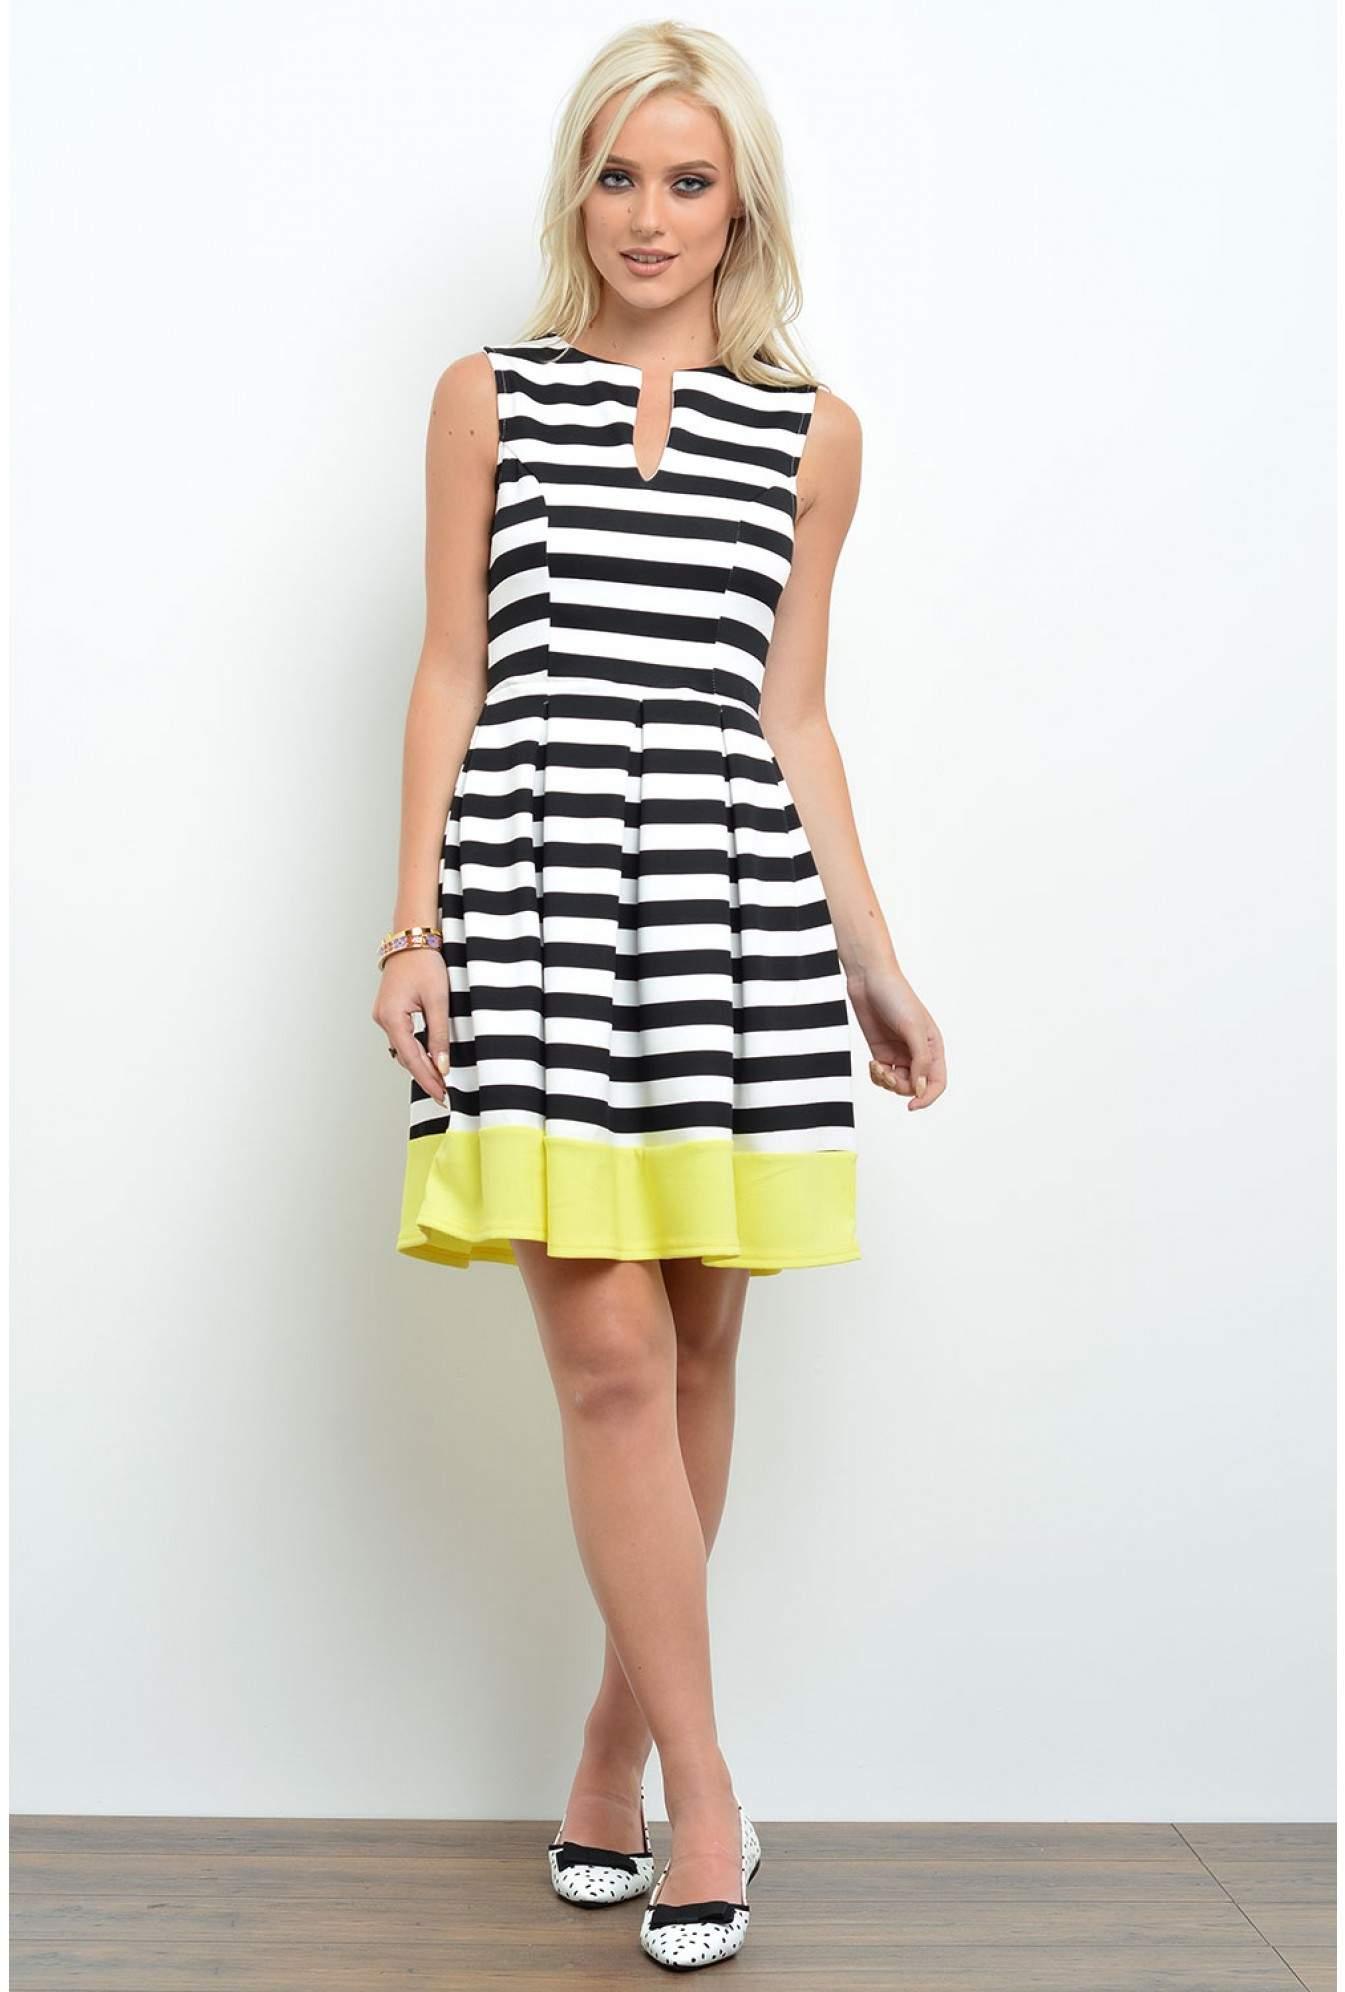 73ddd0c9ef2d8 Kimberly Striped Contrast Dress in Multi Yellow